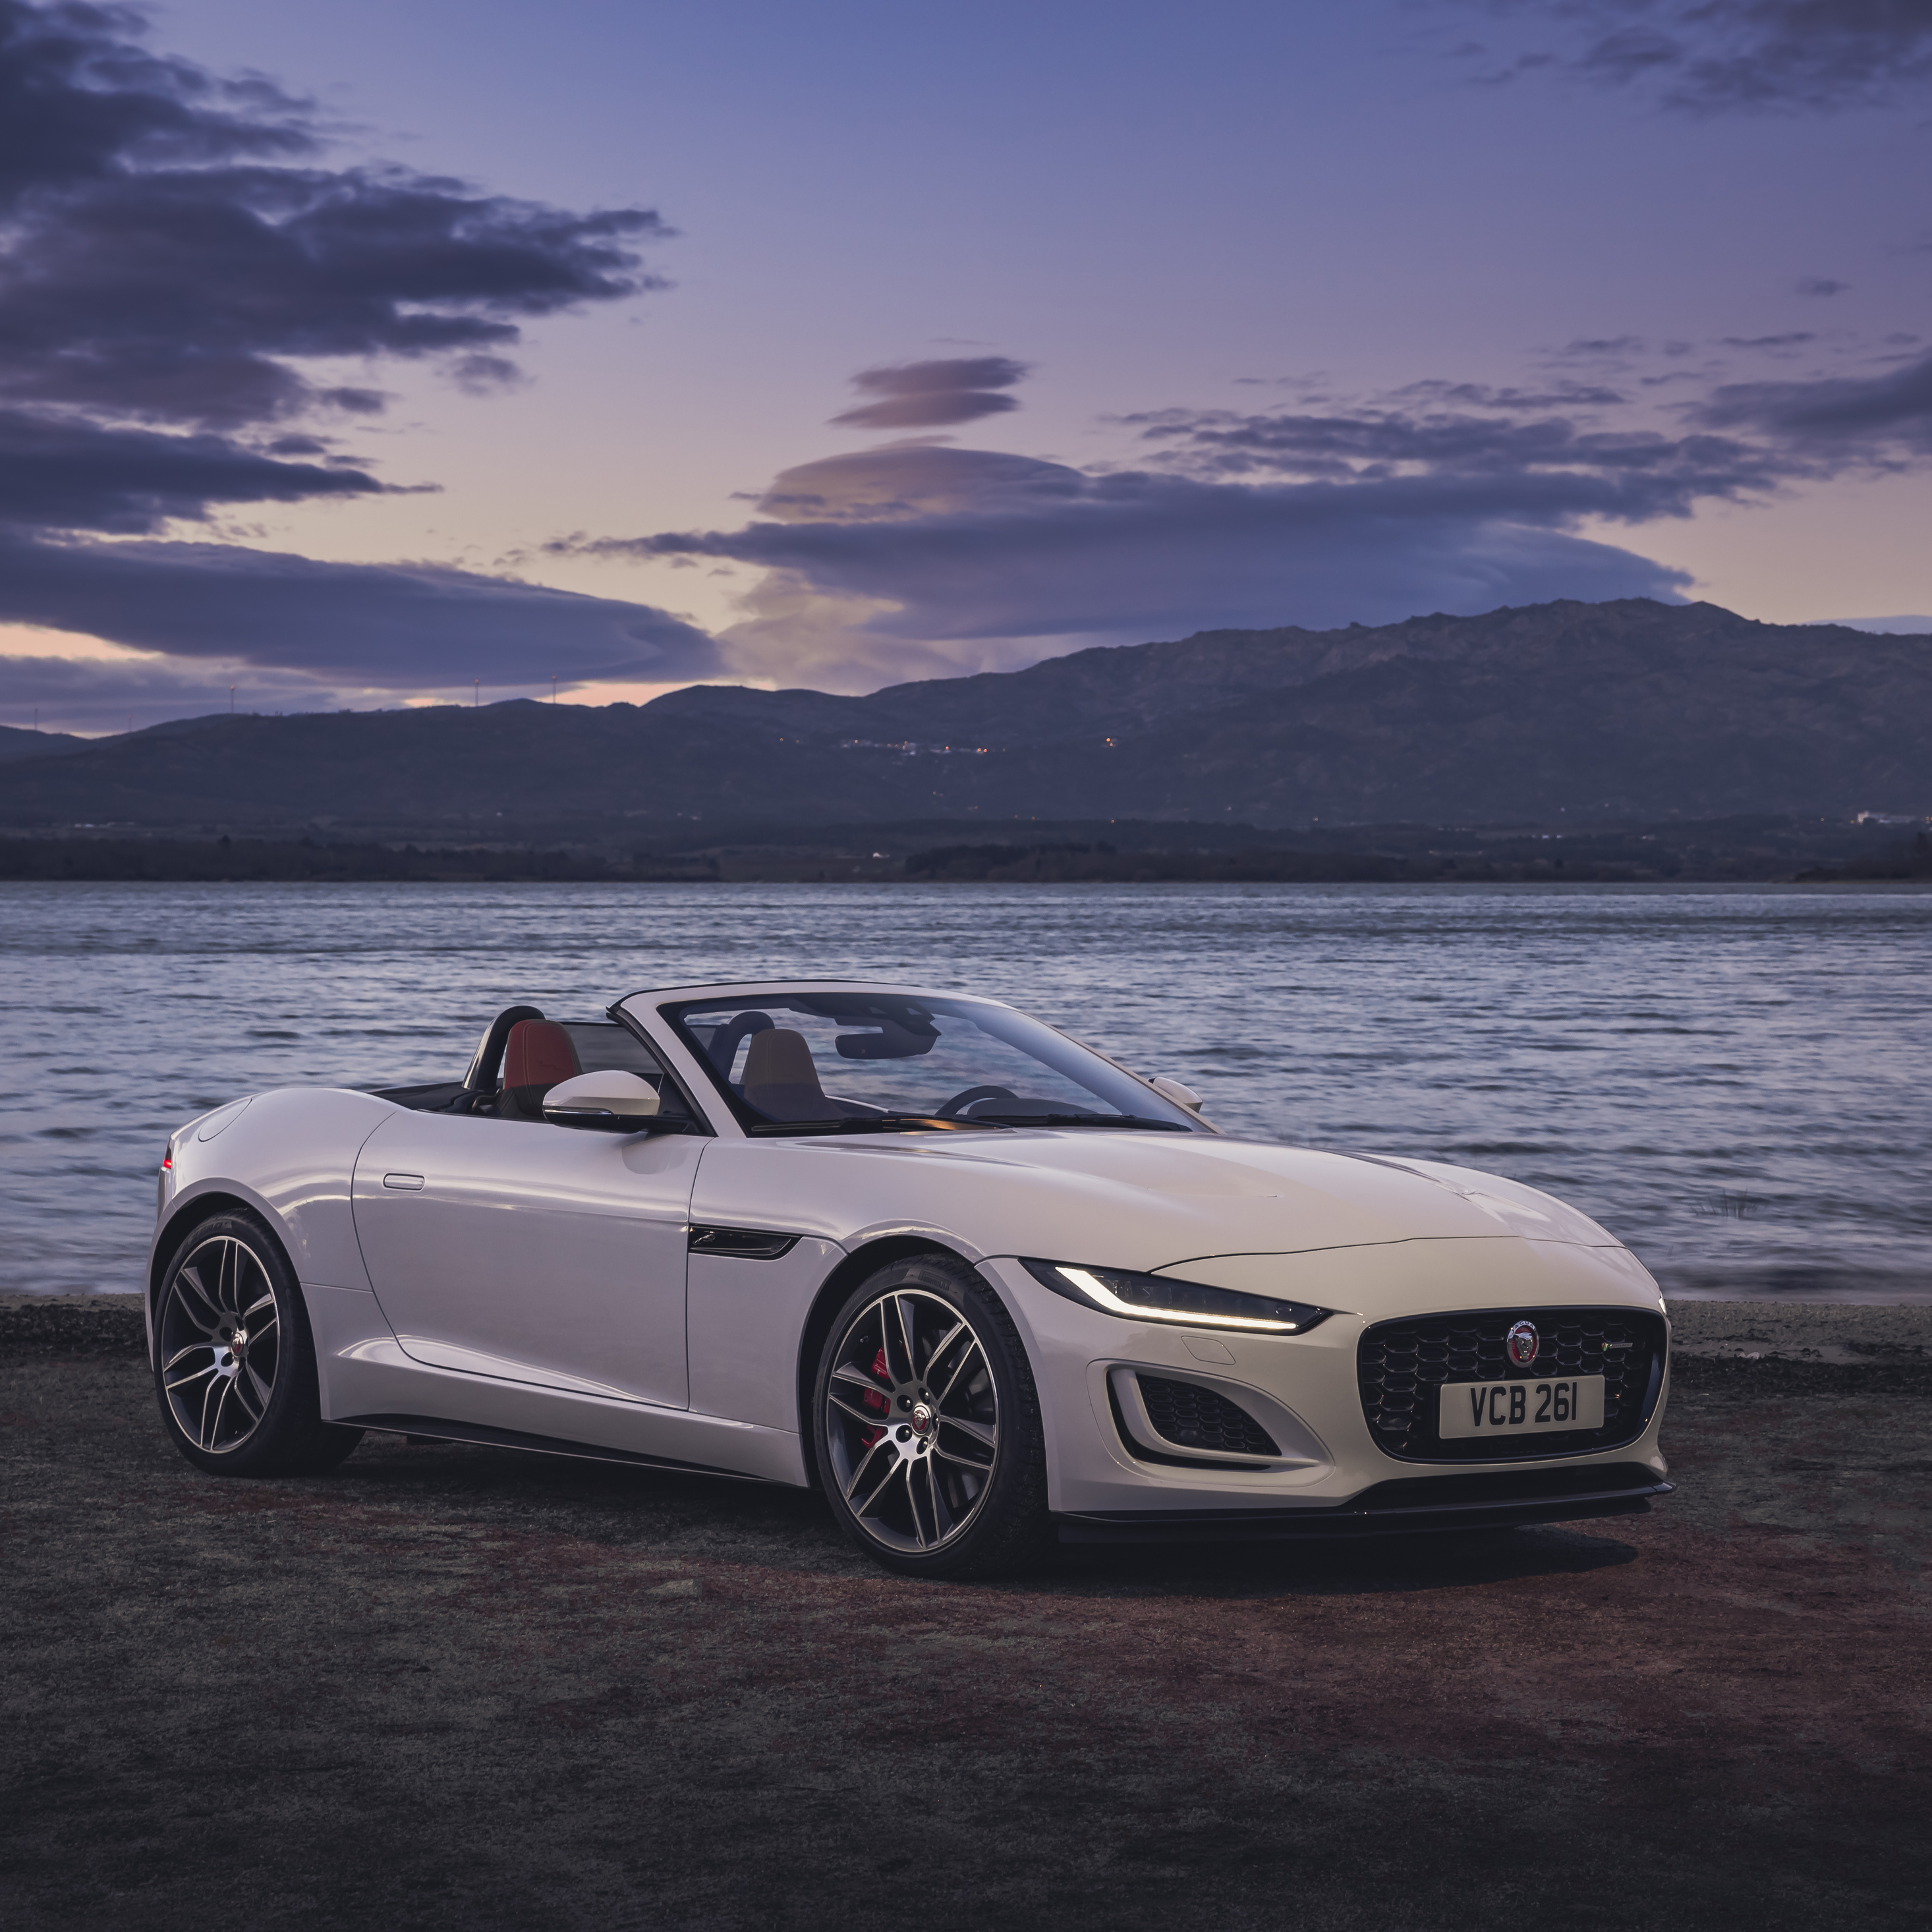 jaguar-f-type-p450-r-dynamic-convertible-2020-ba.jpg